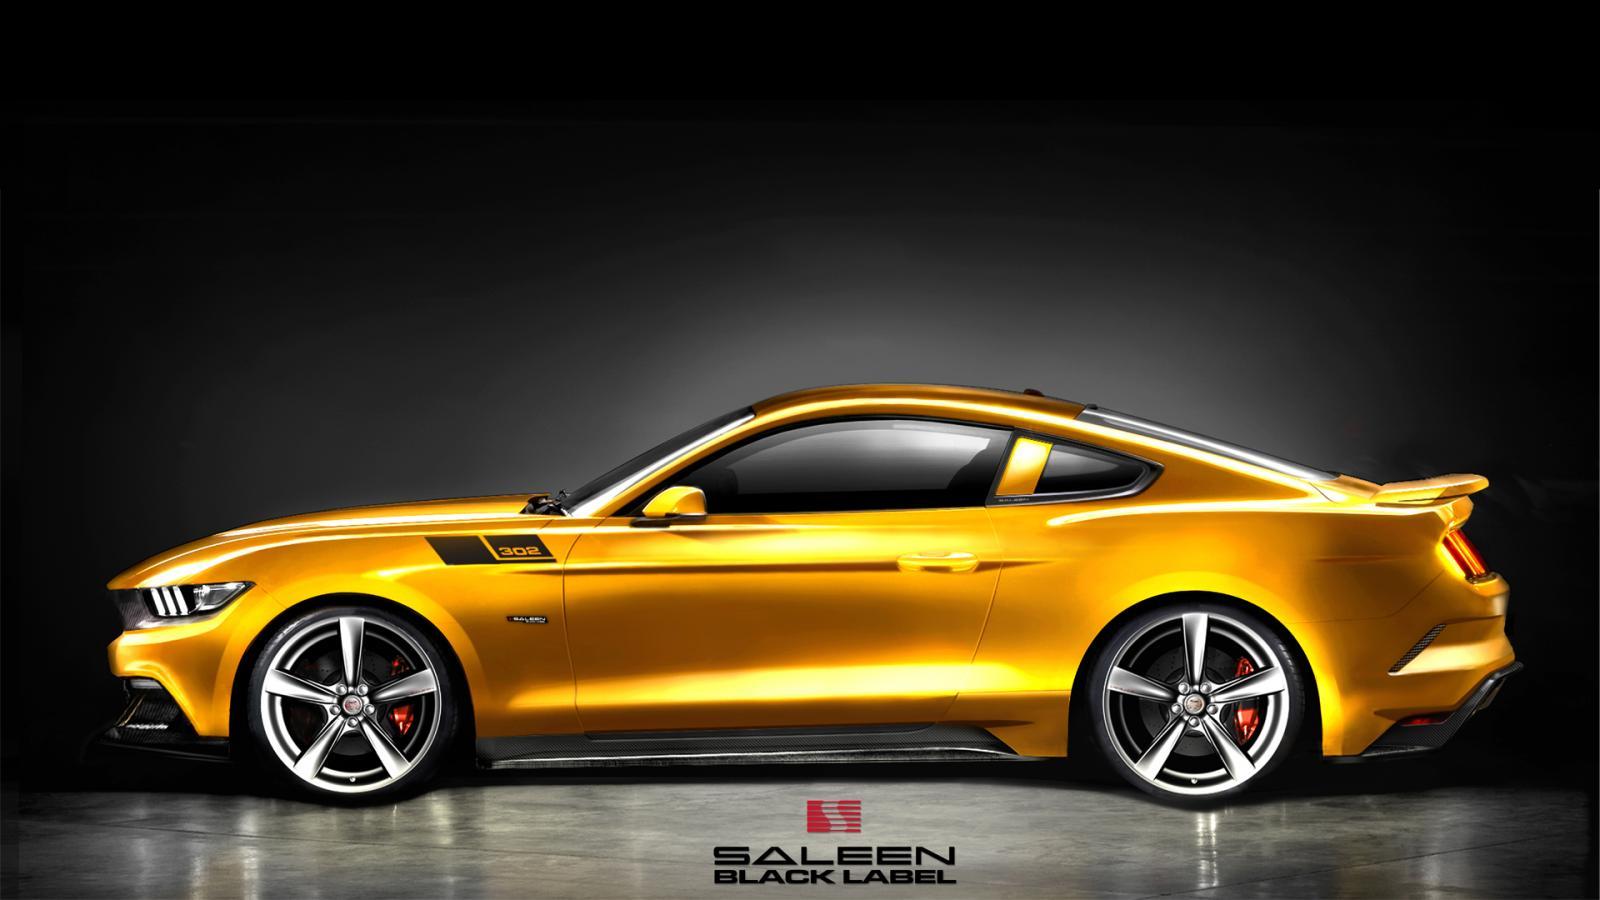 2015 Saleen S302 Mustang, 2016 Mercedes GLC, Will.i.am's Custom Lexus: This Week's Top Photos